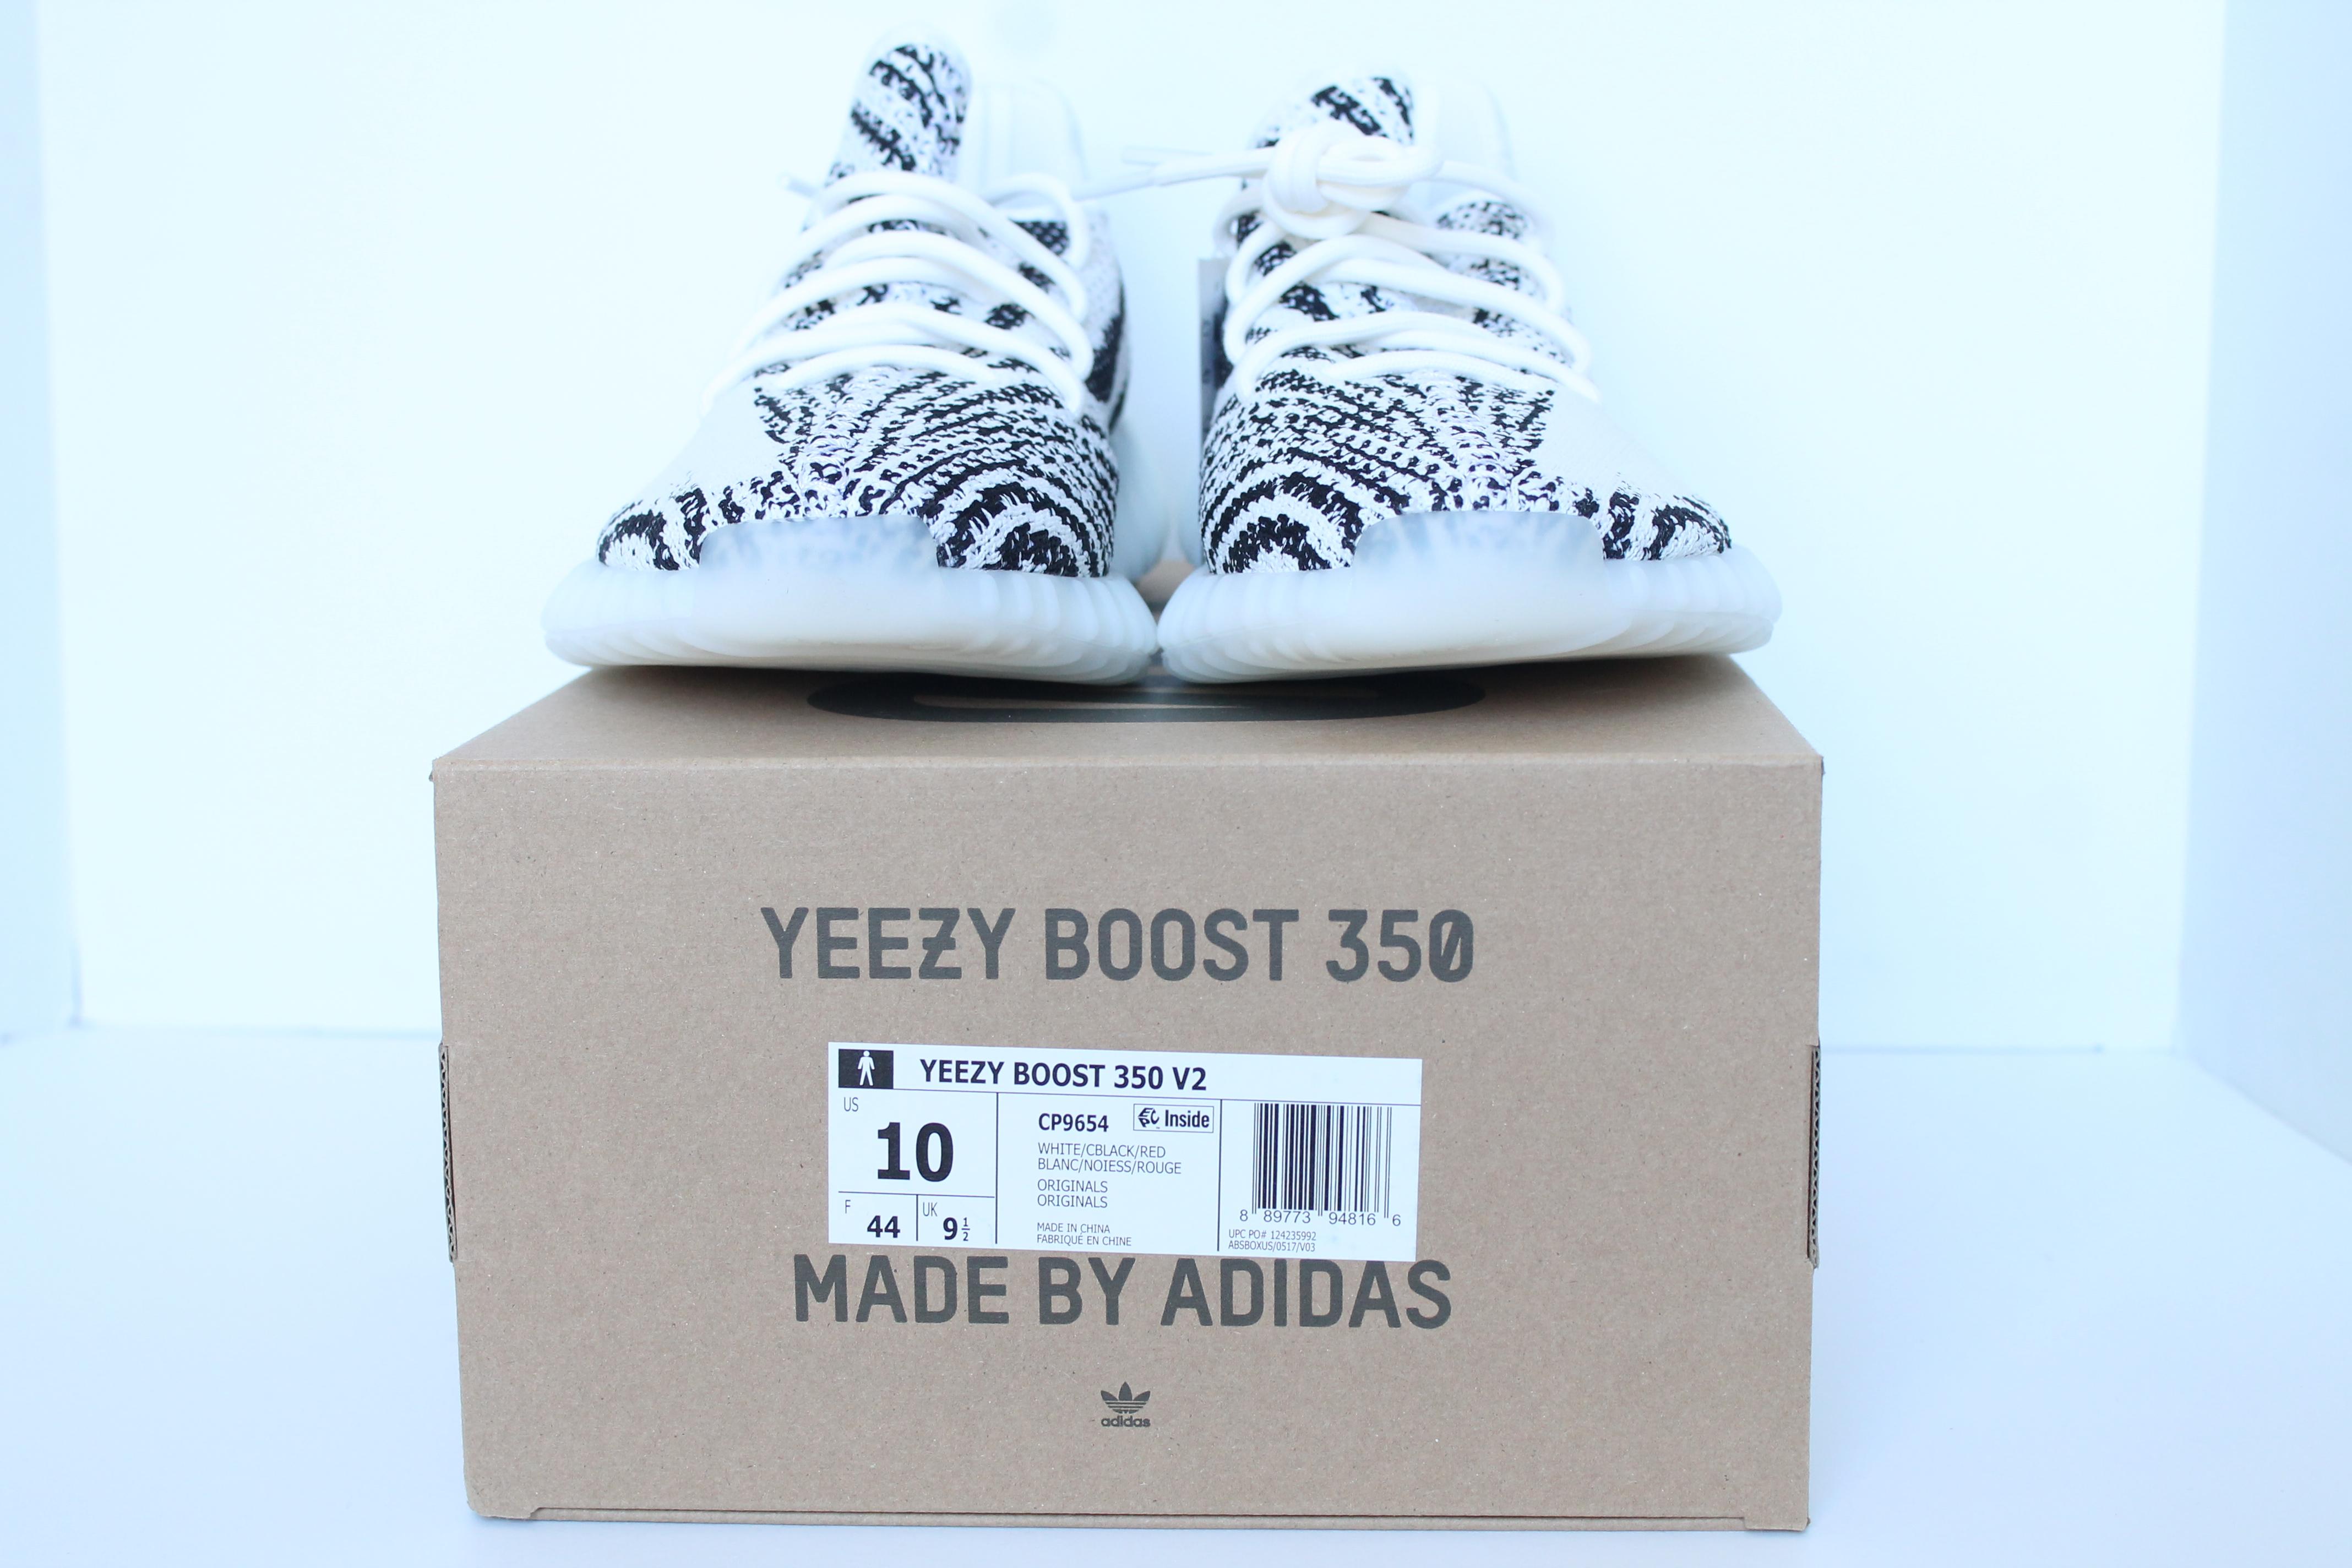 Authentkicks Adidas Yeezy Boost 350 V2 Zebra